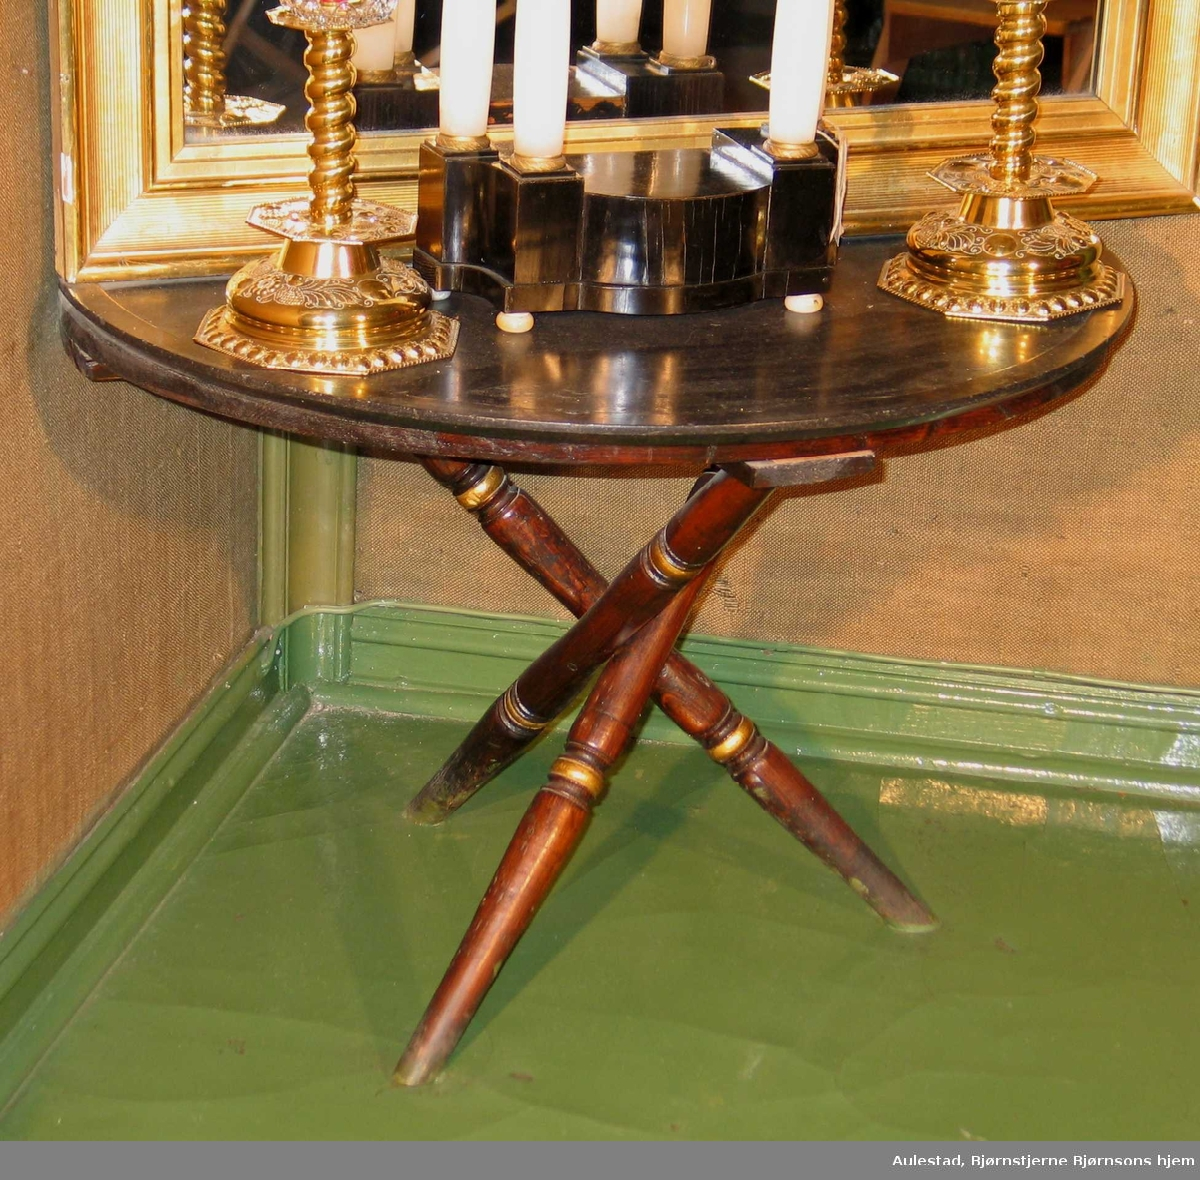 Bord med halvsirkelformet marmorplate på tre kryssede bein. Dreid ringprofil på benene som er brunbeiset og forgylt.